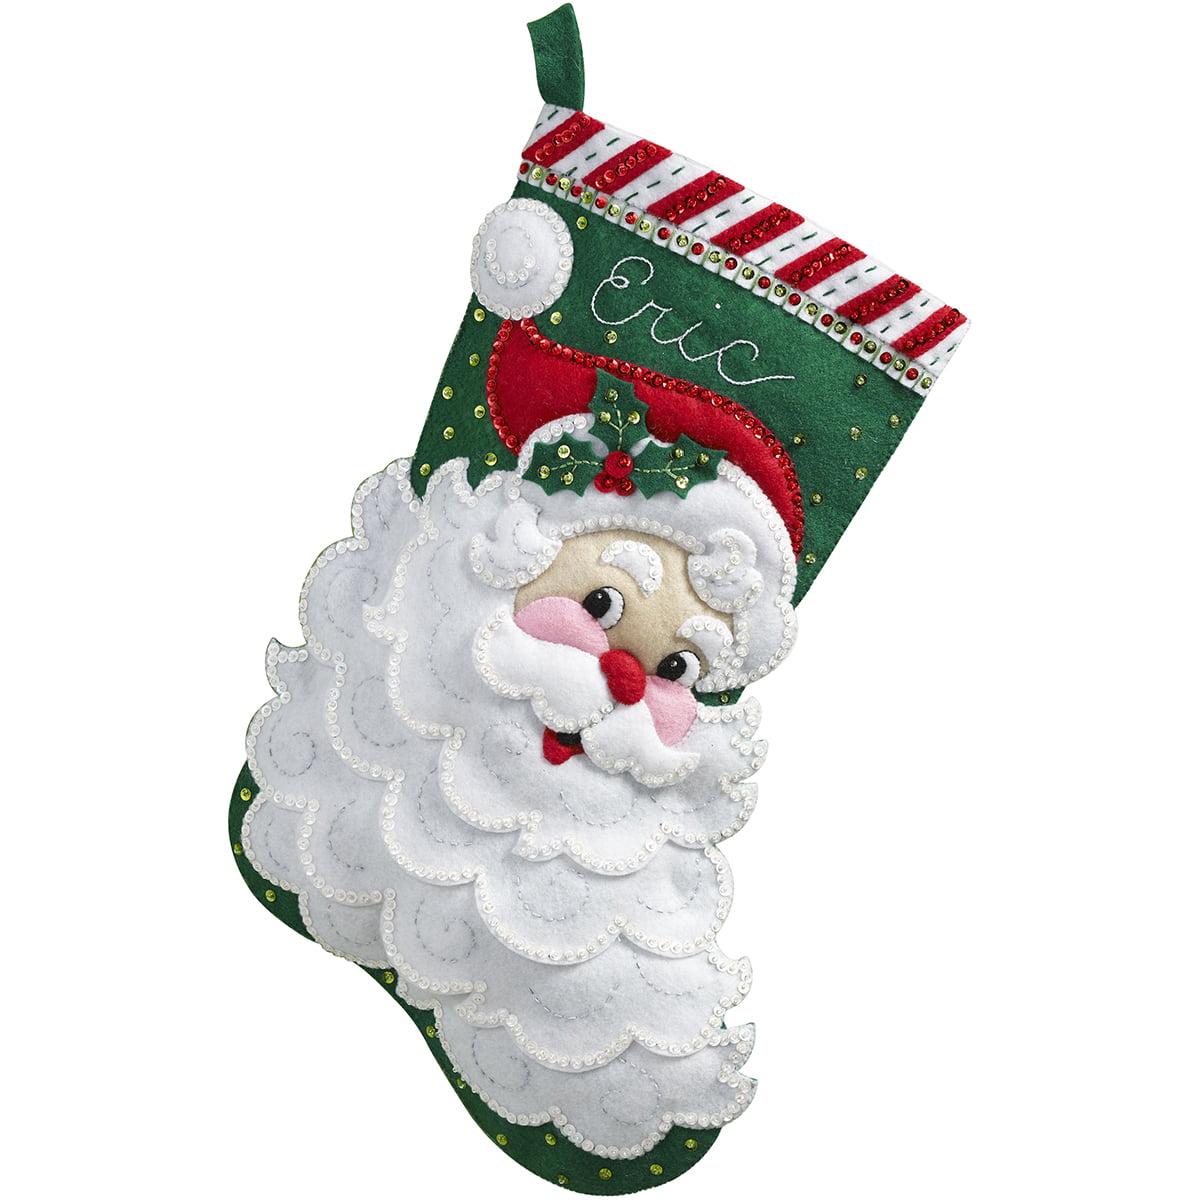 "Jolly Saint Nick Stocking Felt Applique Kit, 18"" Long"